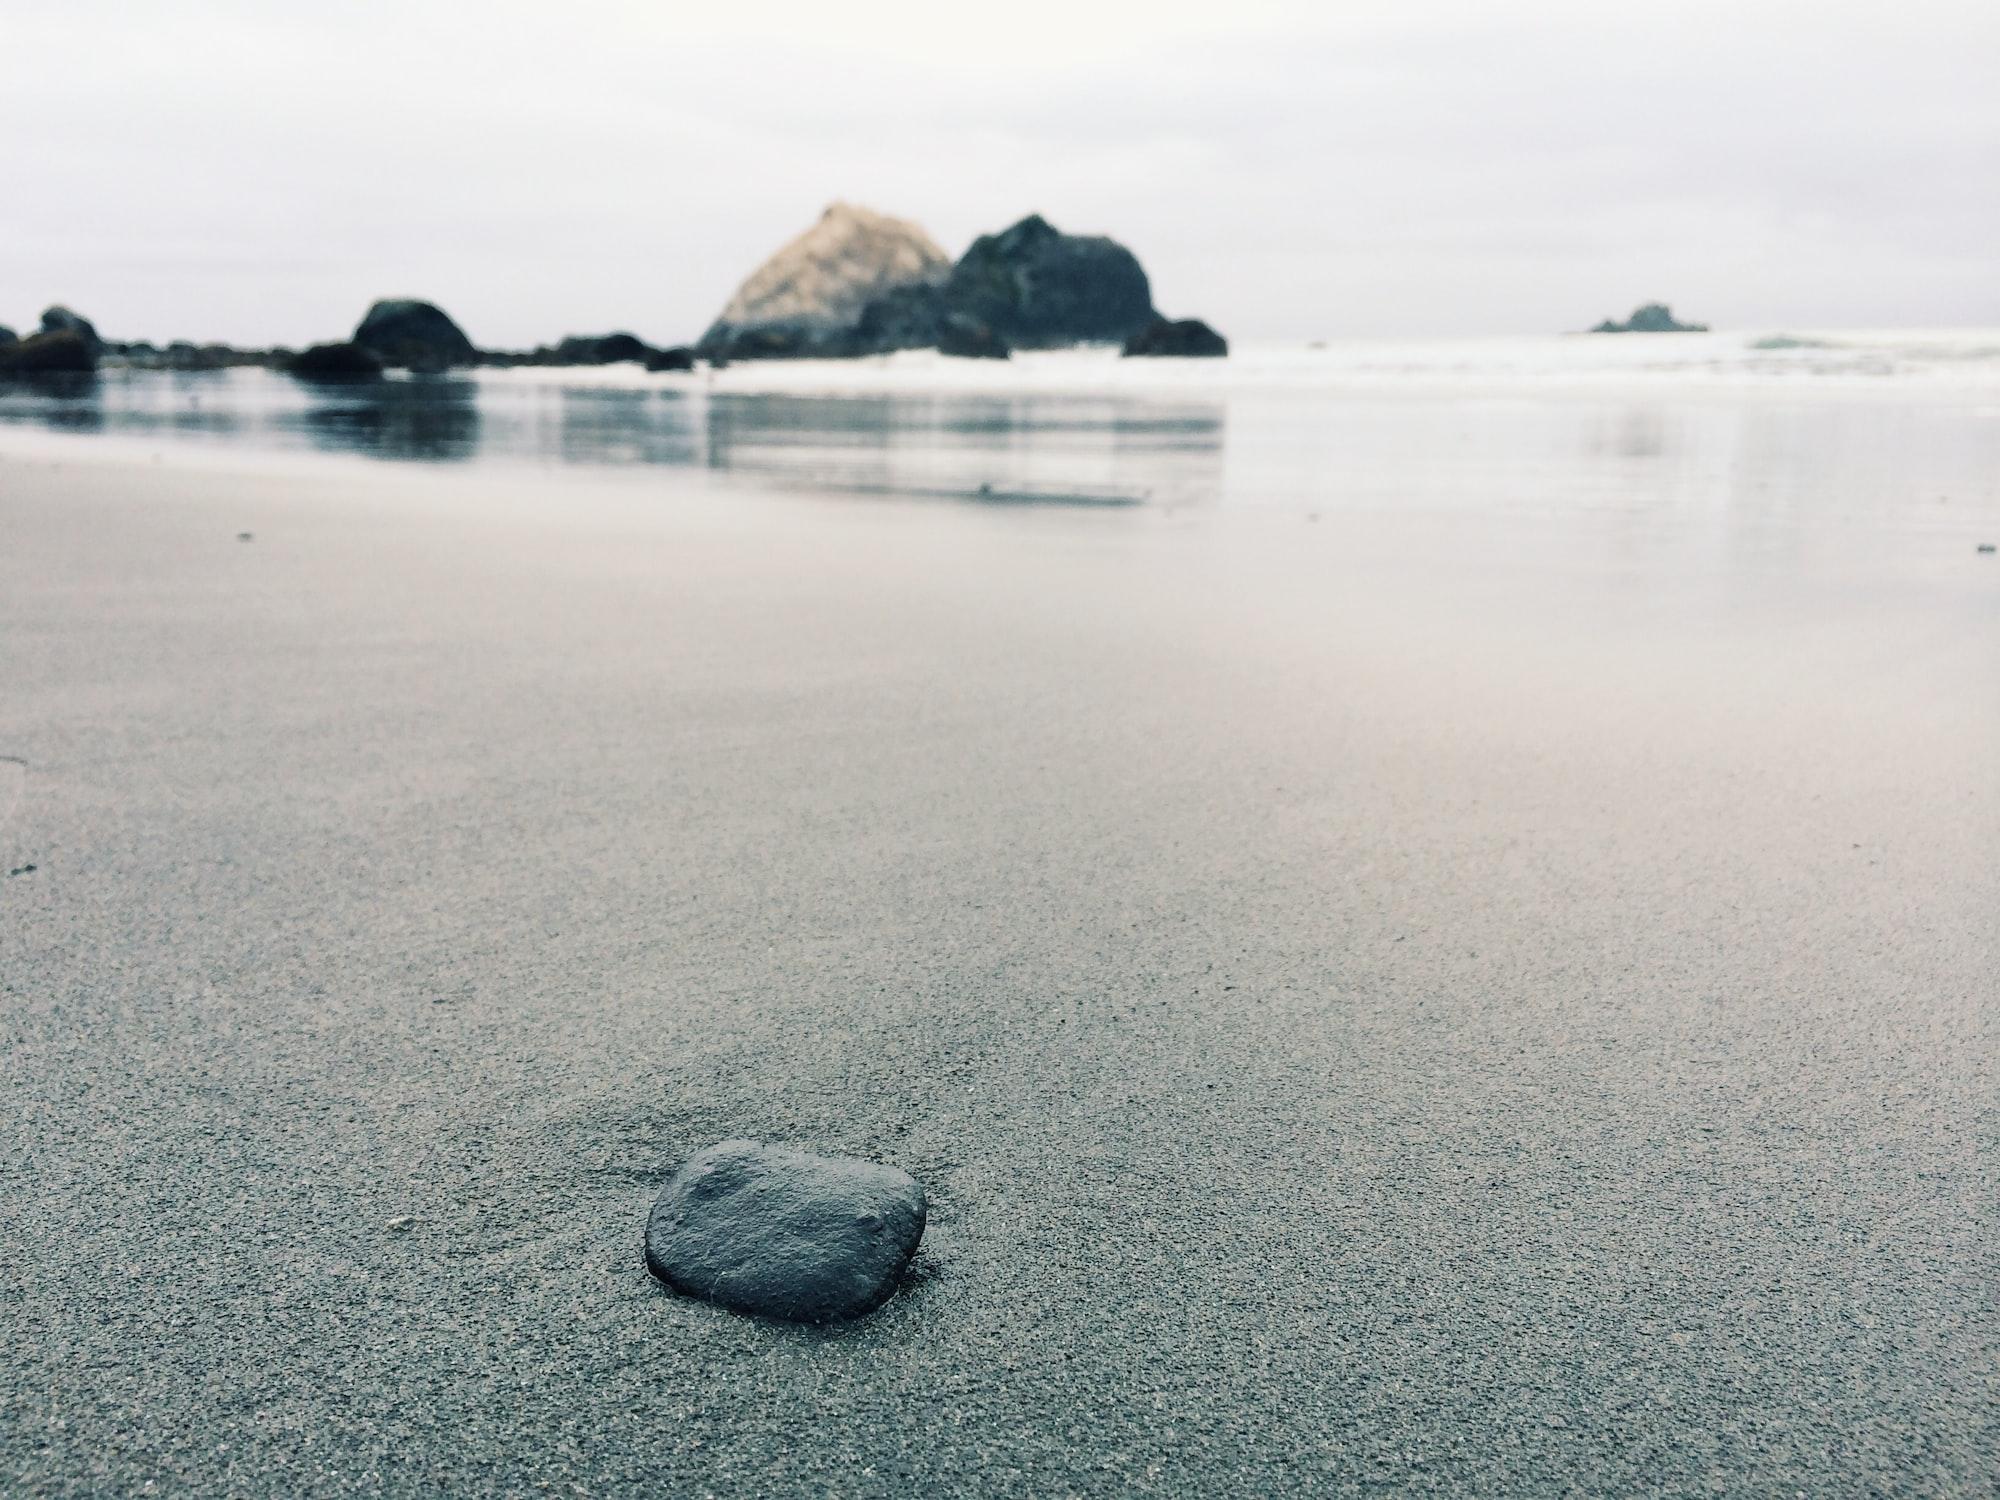 The Impact of A Pebble